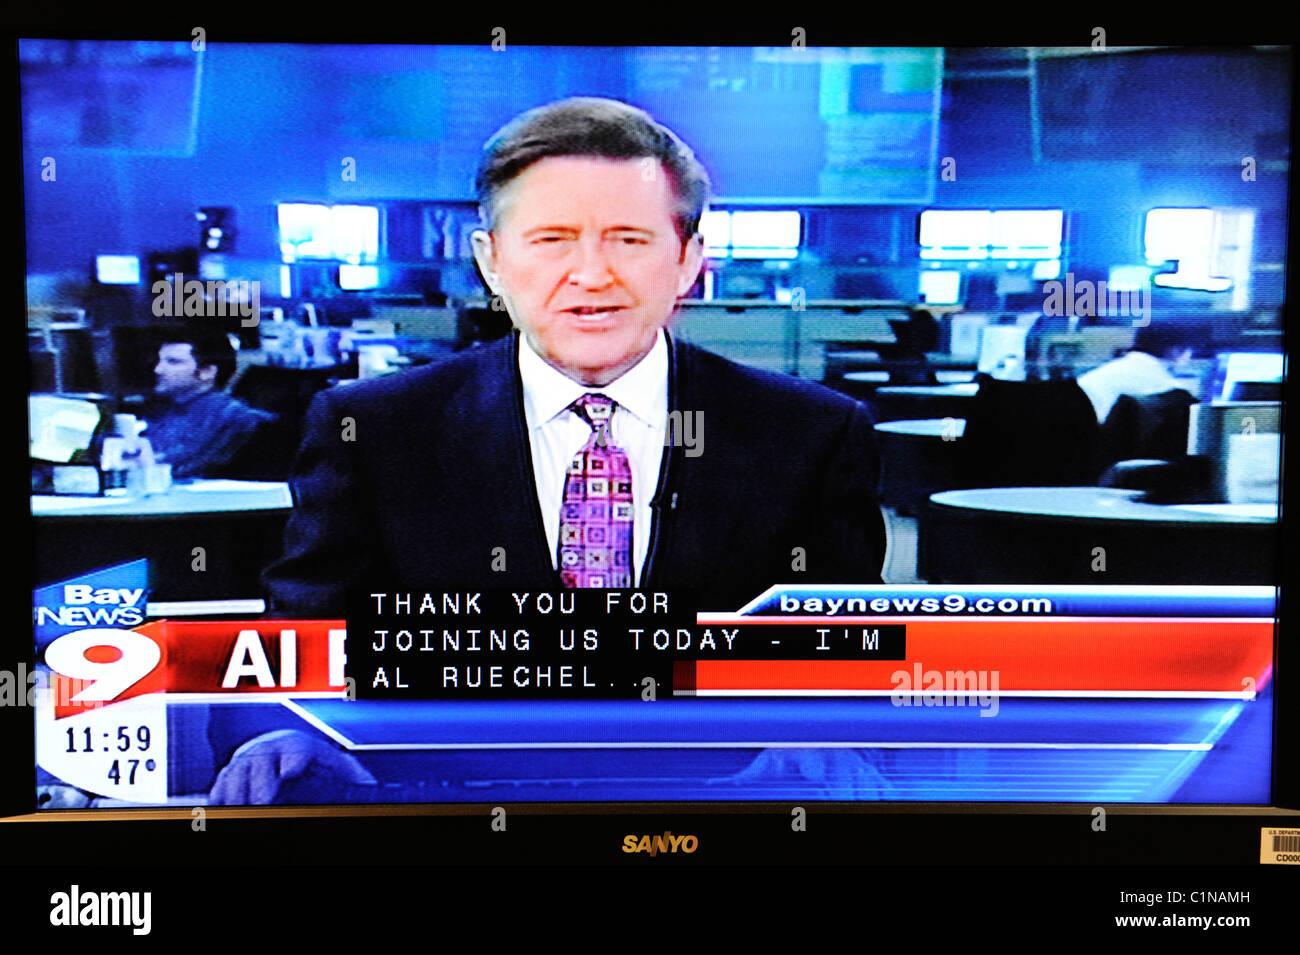 Tv Weather Forecast Stock Photos Tv Weather Forecast